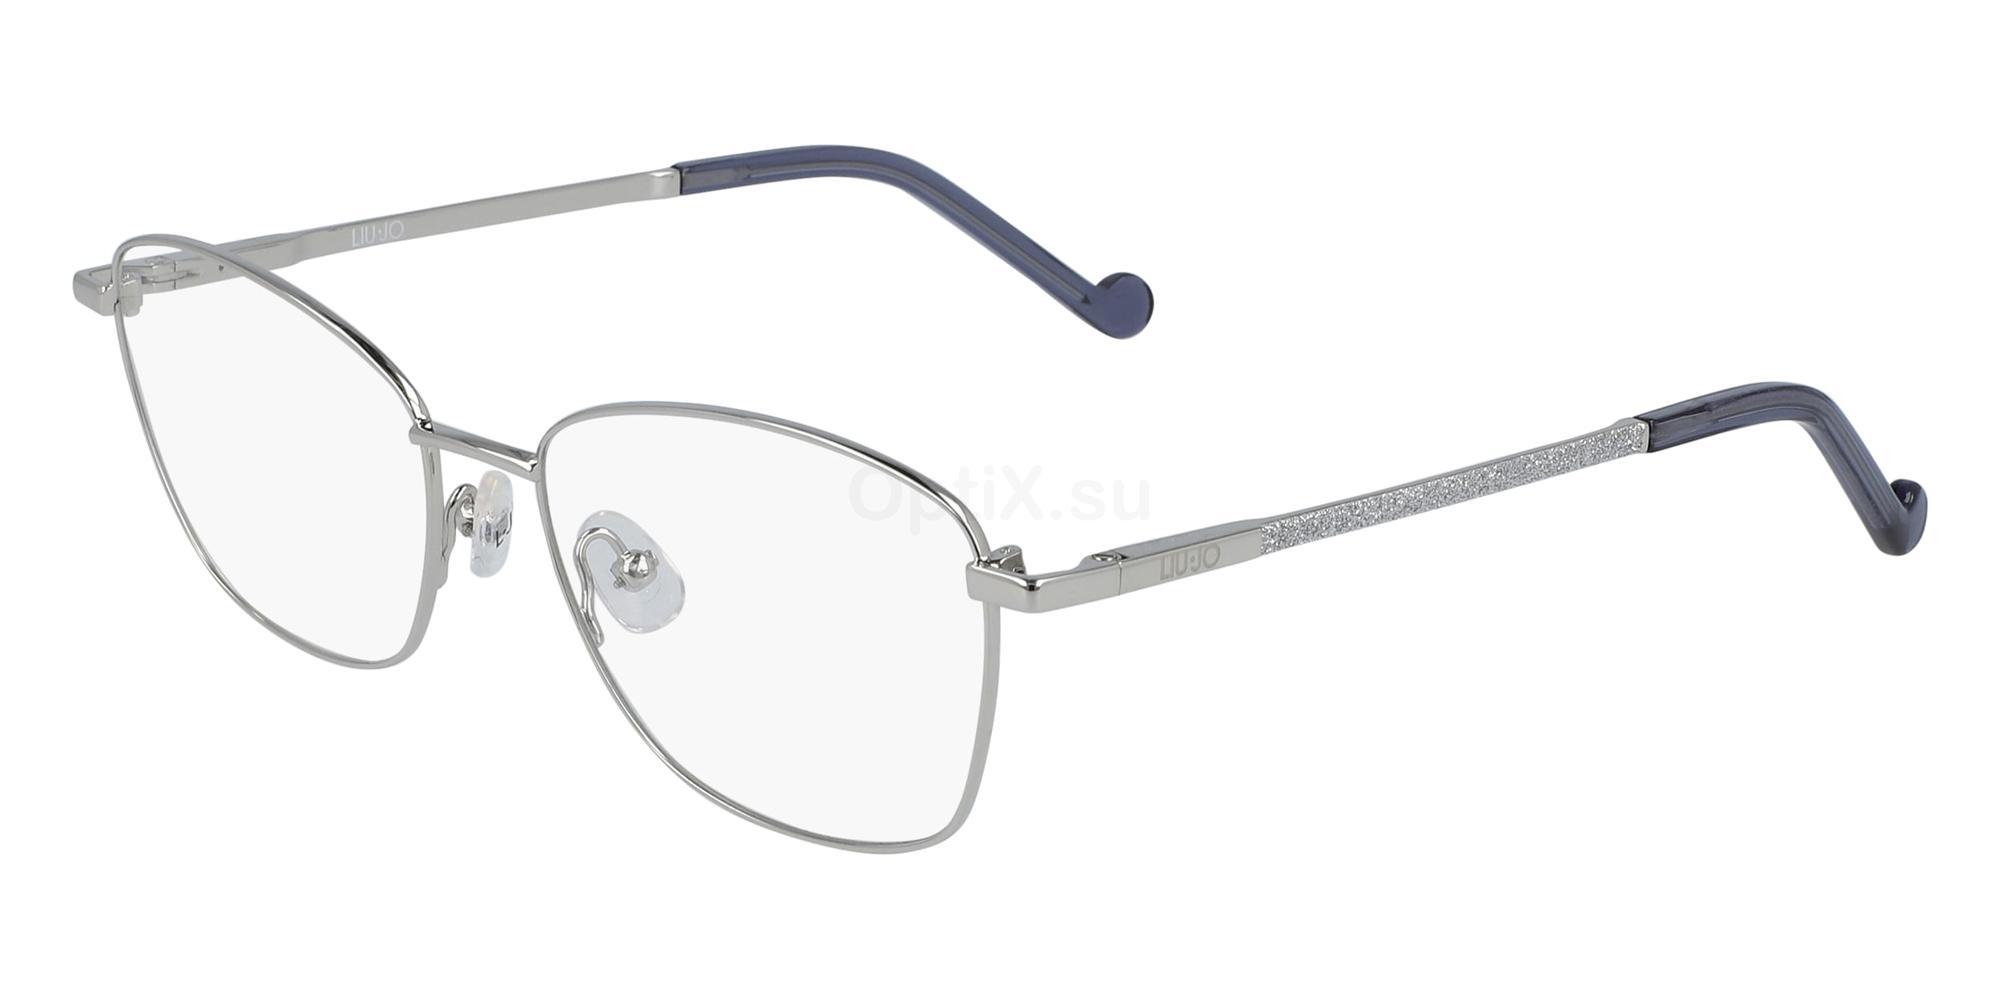 045 LJ2144 Glasses, Liu Jo